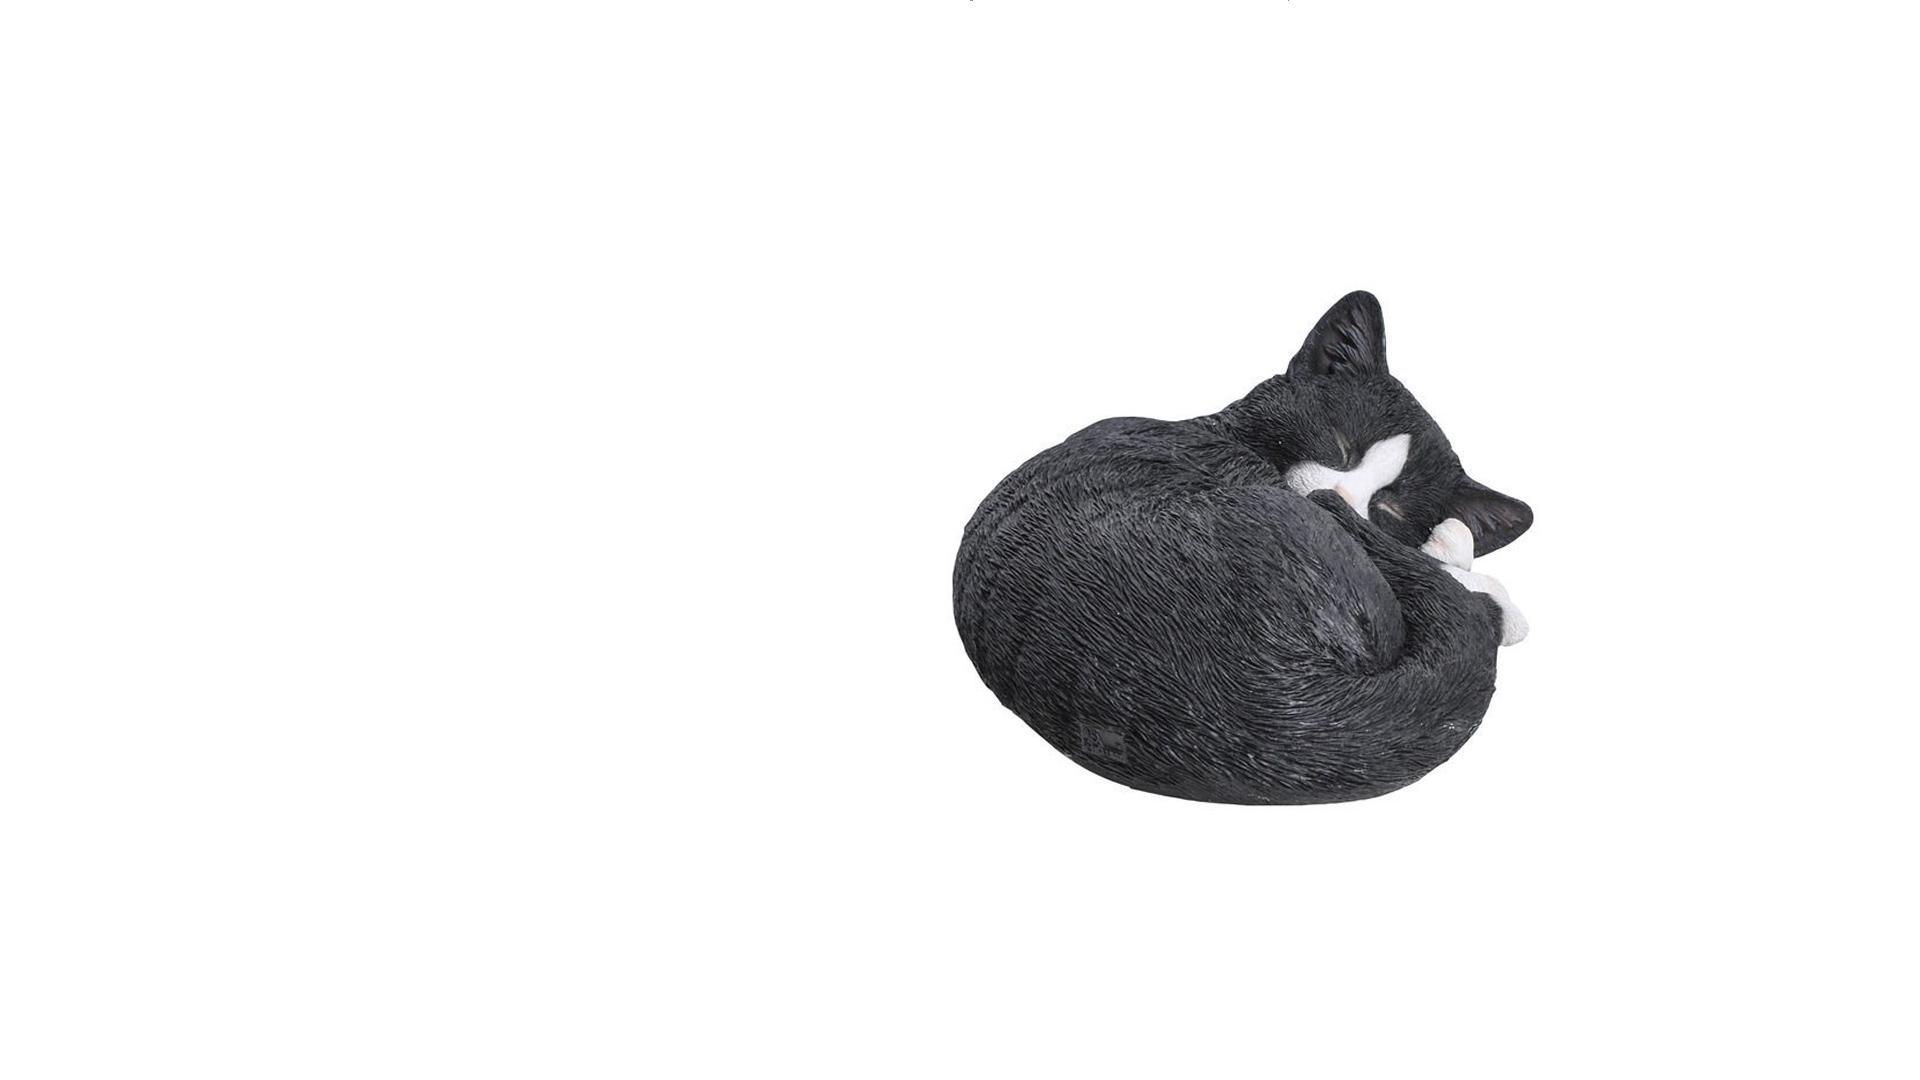 Sleeping Black Cat - Big Brother 2017